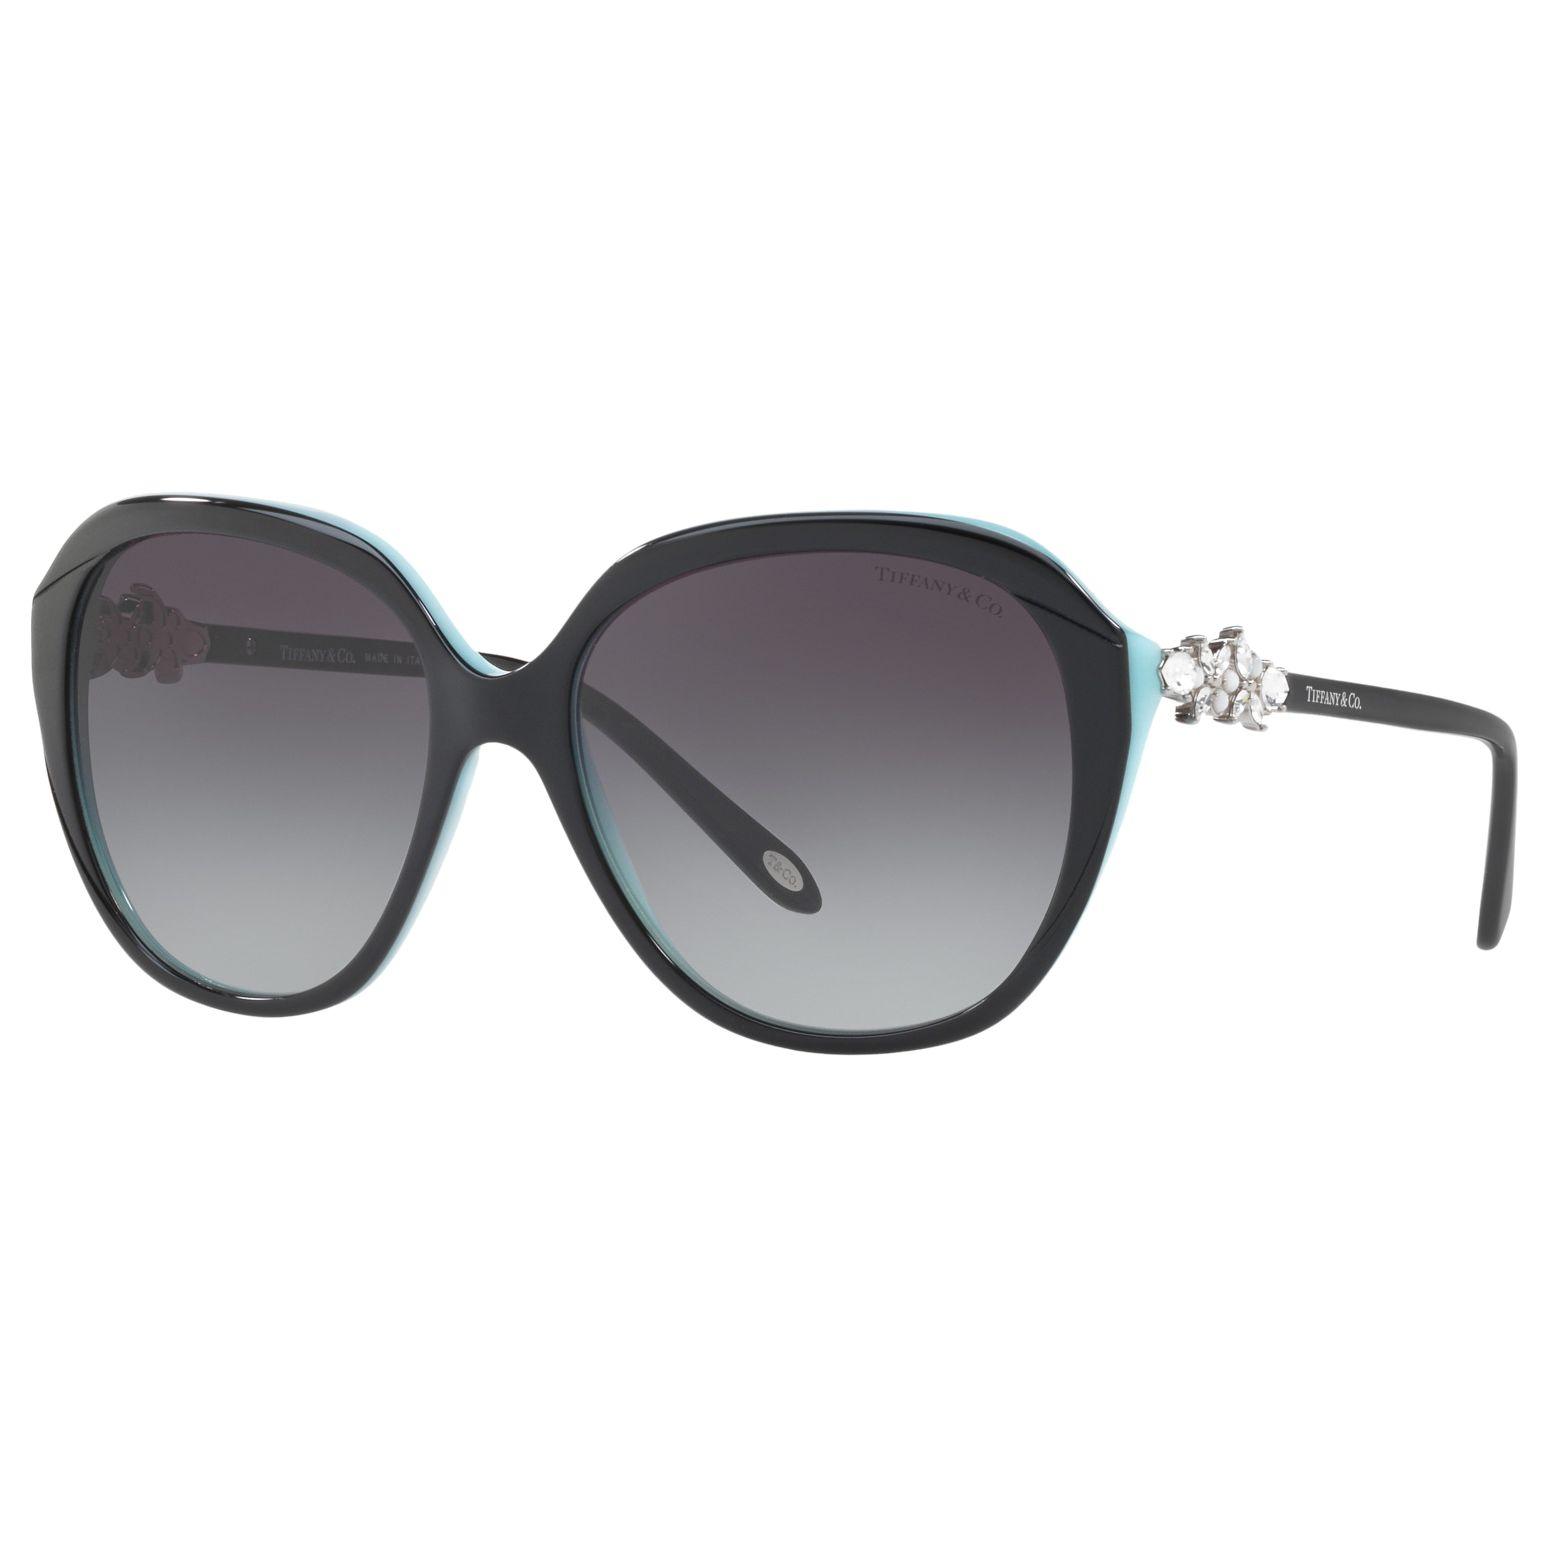 Tiffany & Co Tiffany & Co TF4132HB Embellished Square Sunglasses, Polished Black/Grey Gradient